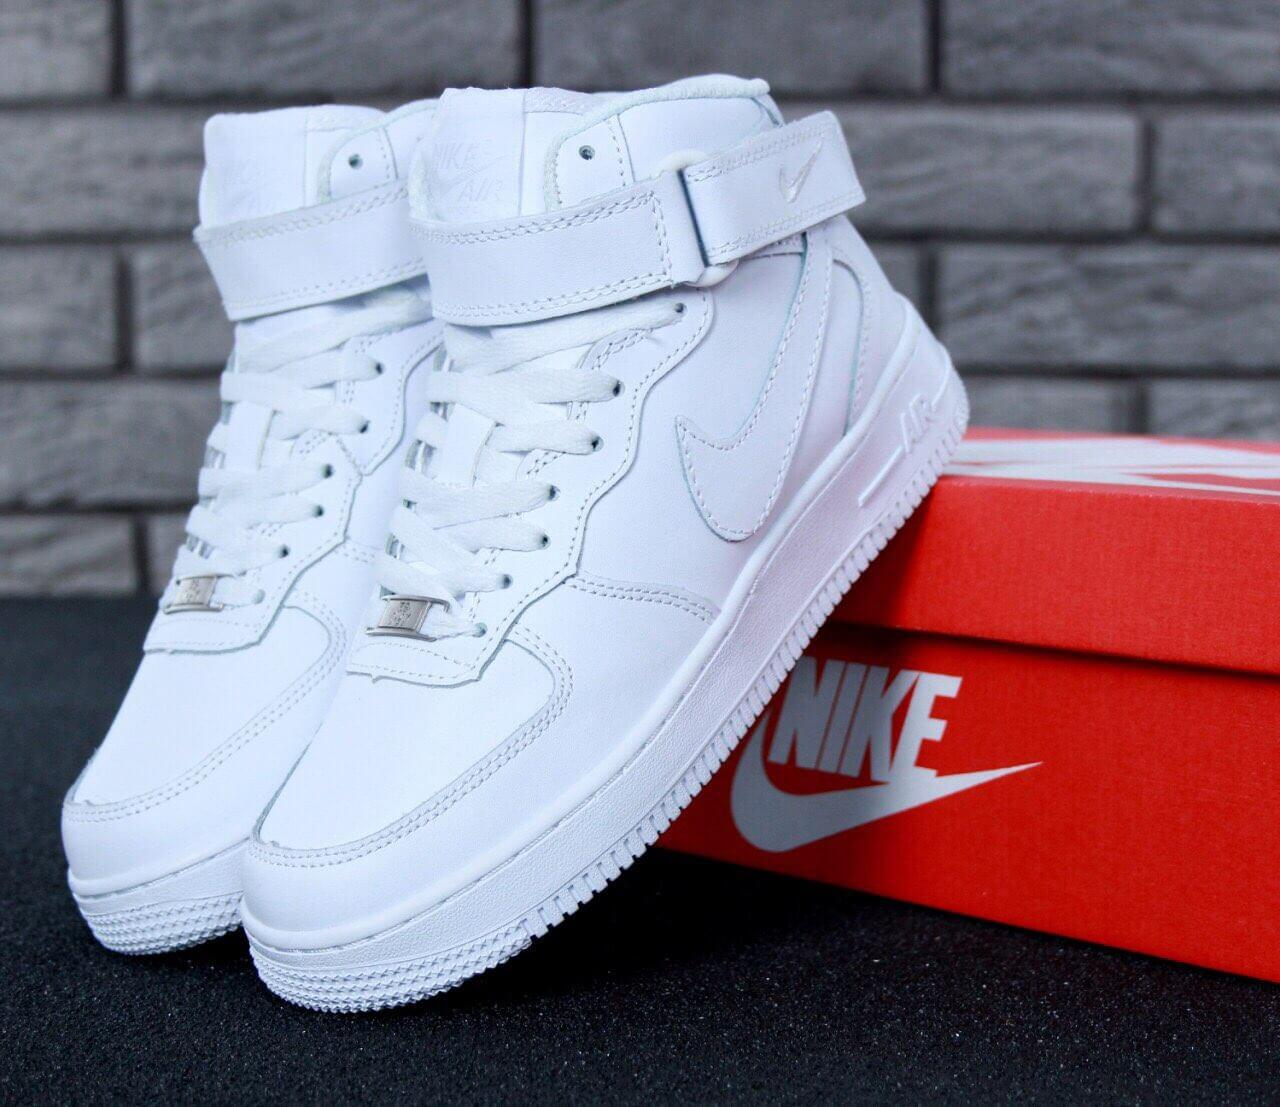 8cf84d26 Кроссовки с мехом Nike Air Force 1 High White Winter - Интернет магазин  обуви «im